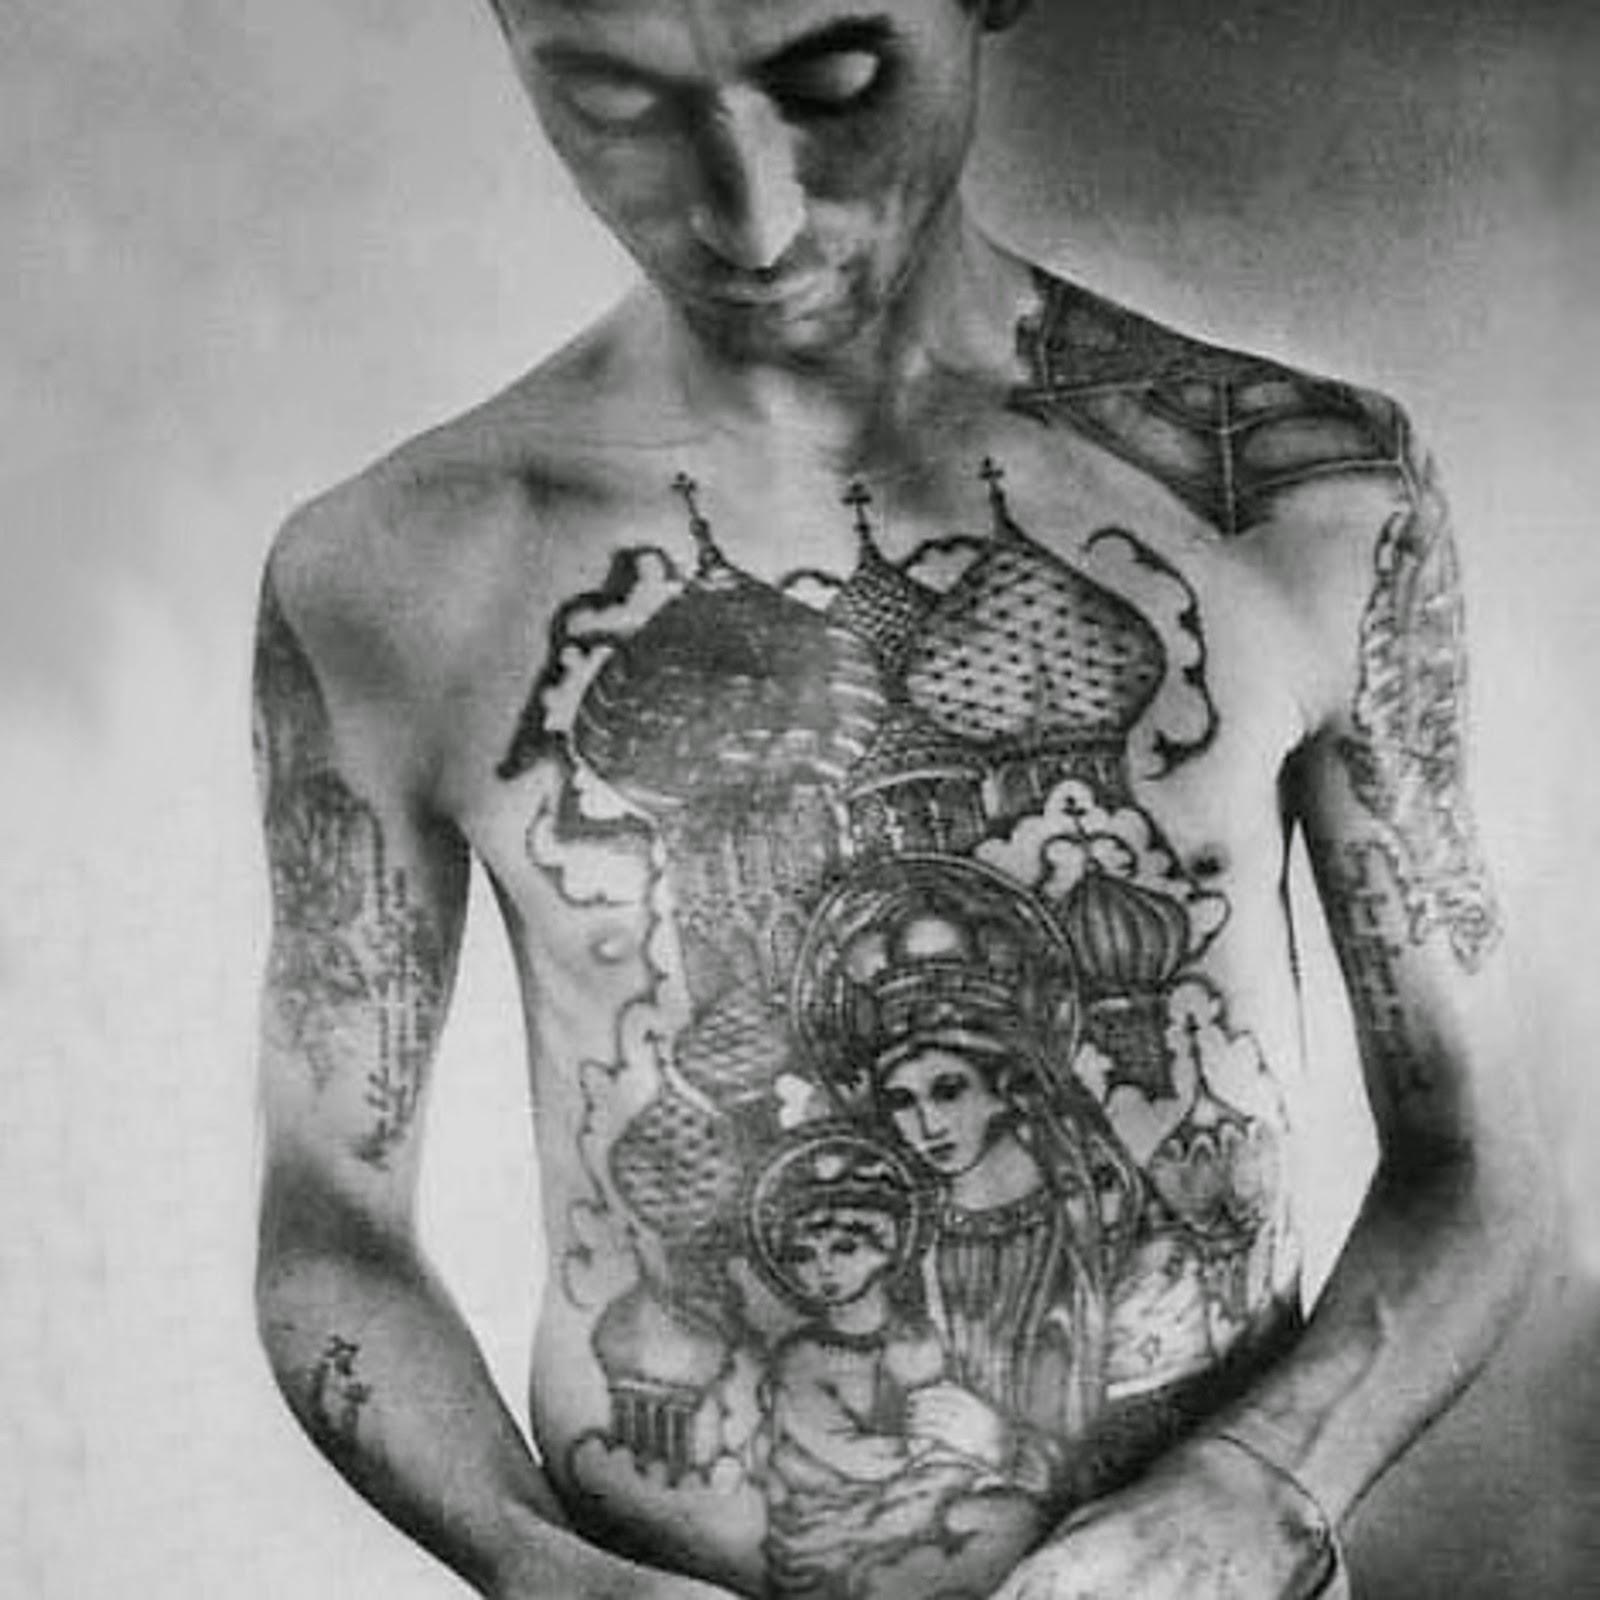 tattoo art russian criminal tattoos madonna and child. Black Bedroom Furniture Sets. Home Design Ideas